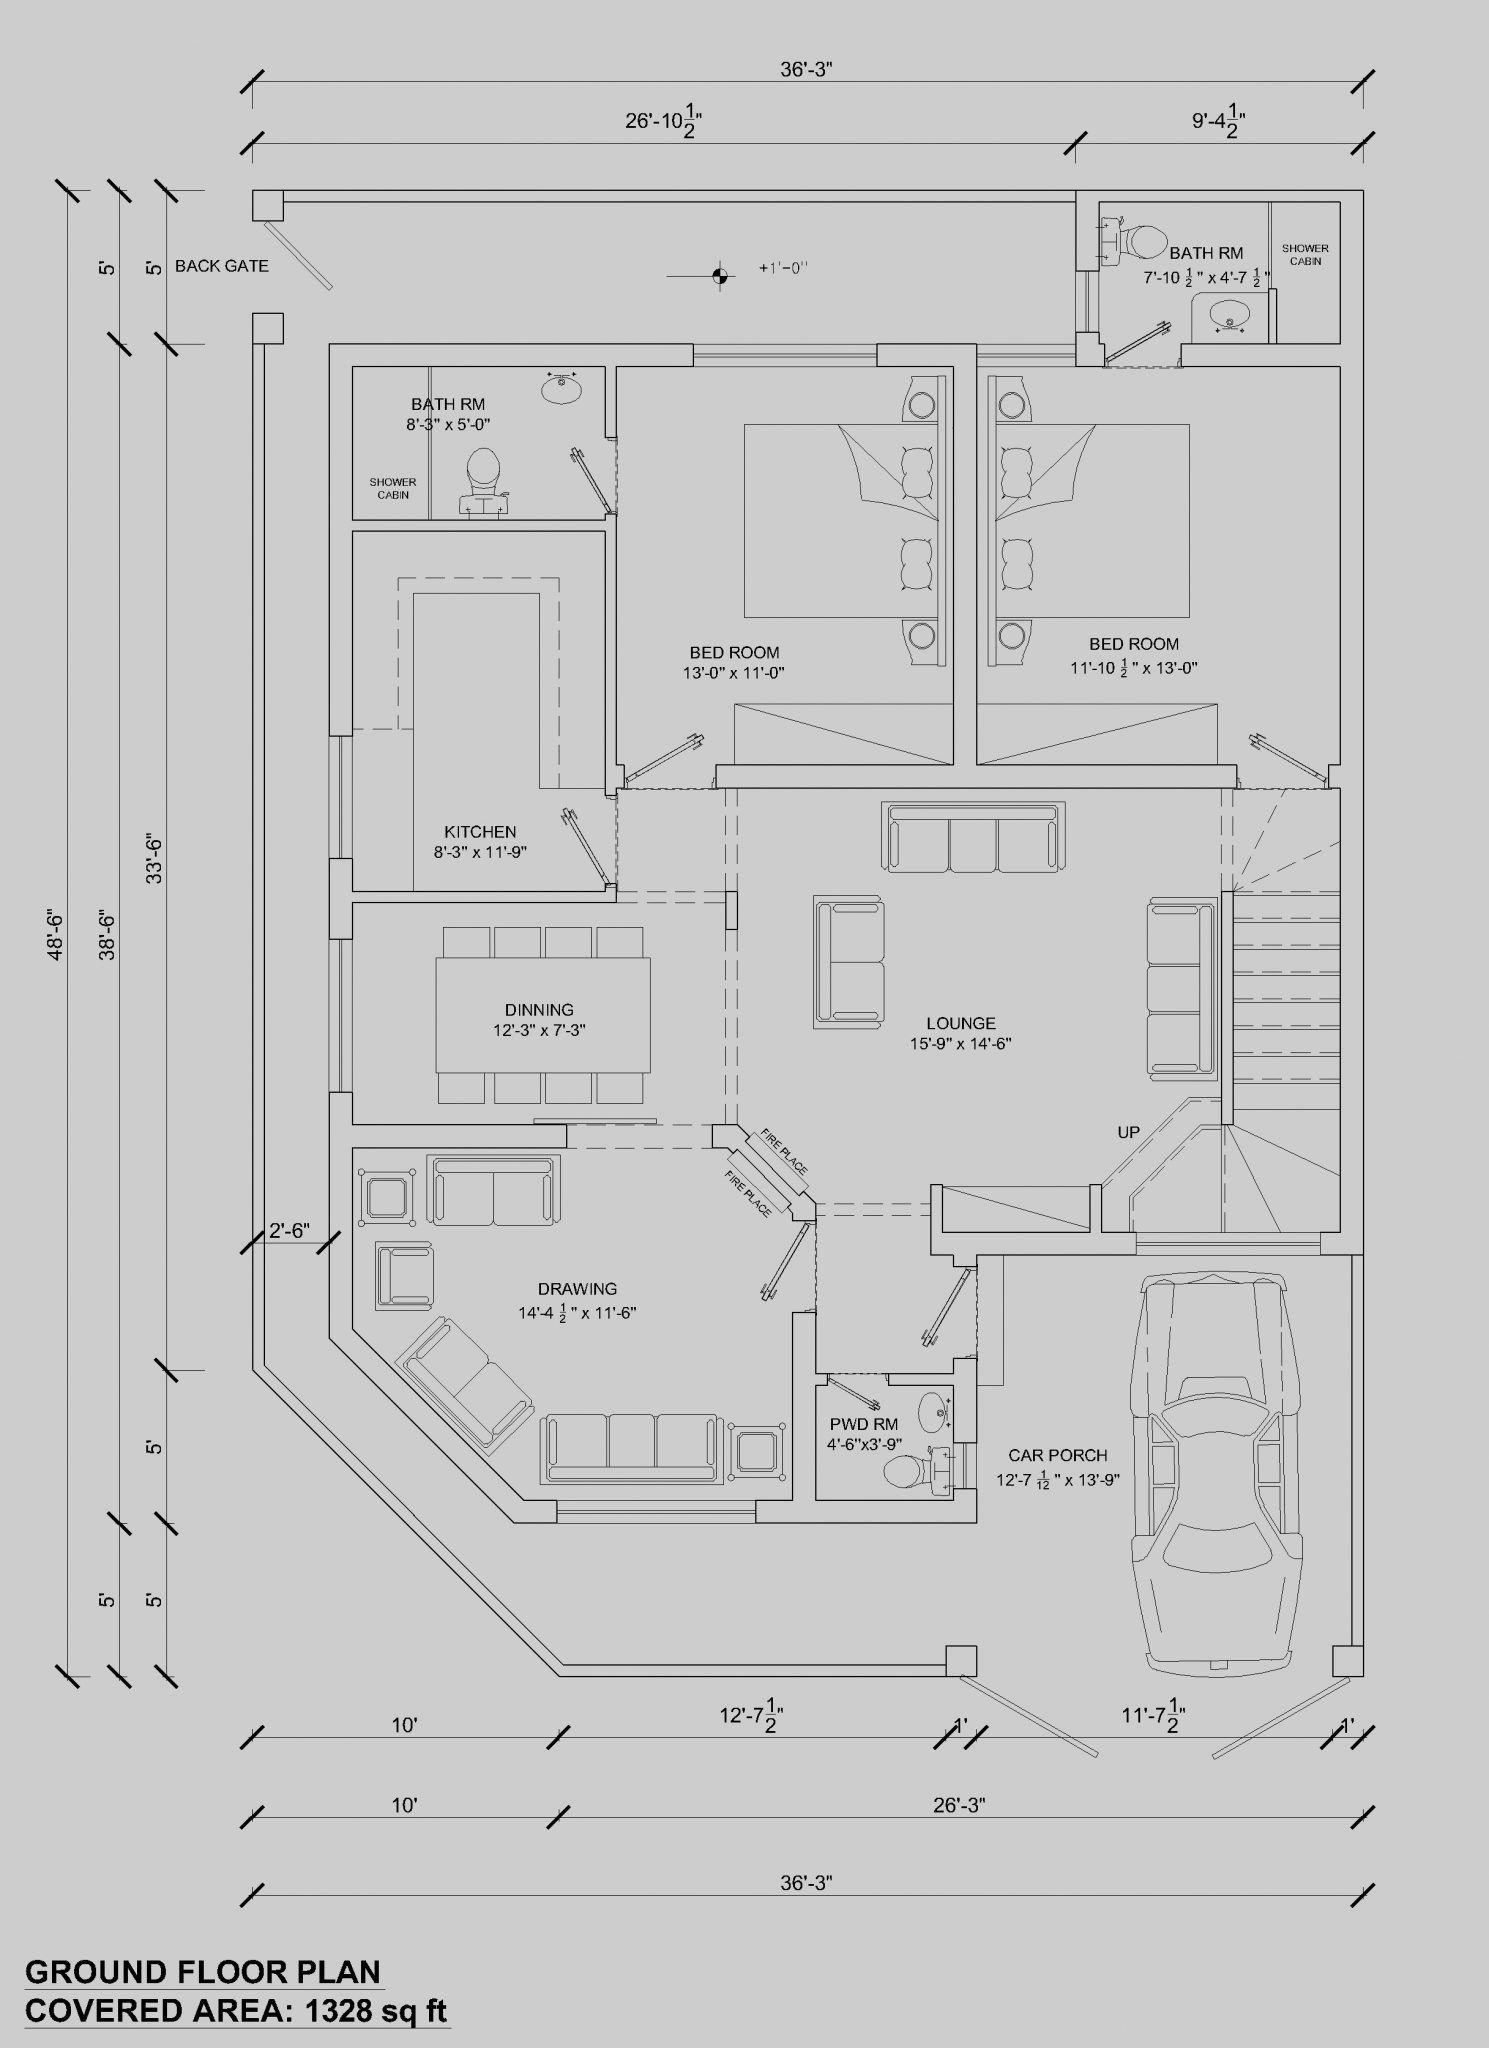 House Floor Plan By 360 Design Estate 7 5 Marla Elegant Kitchen Design House Floor Plans